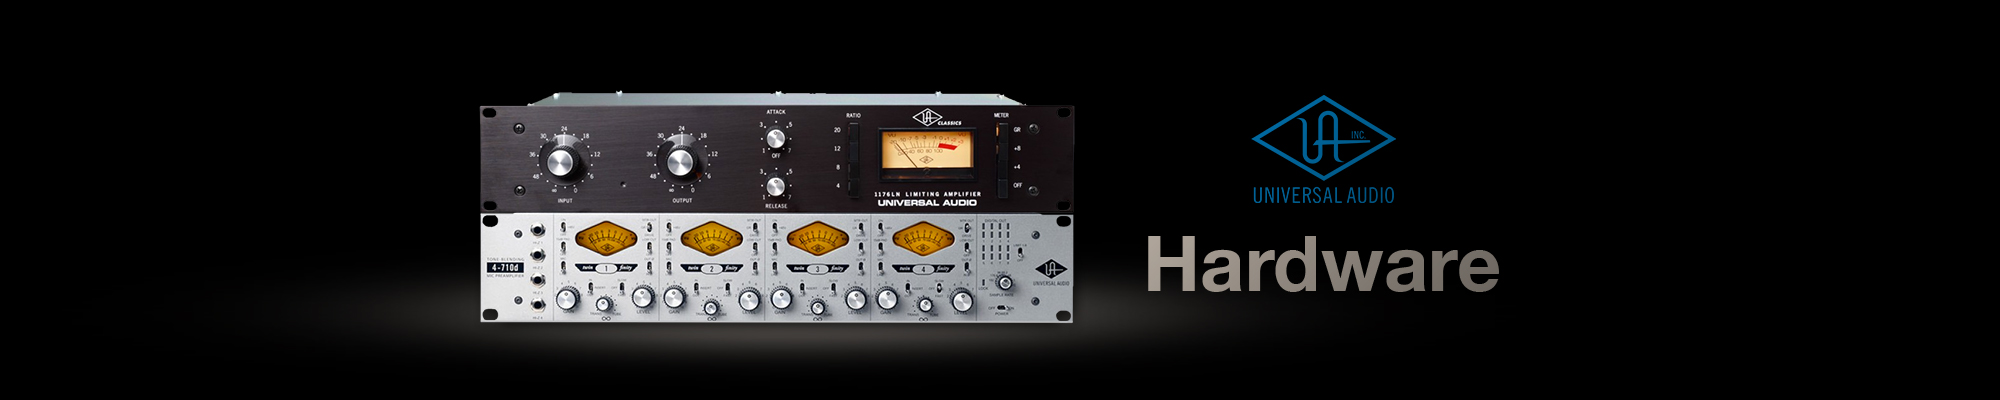 Universal Audio Hardware